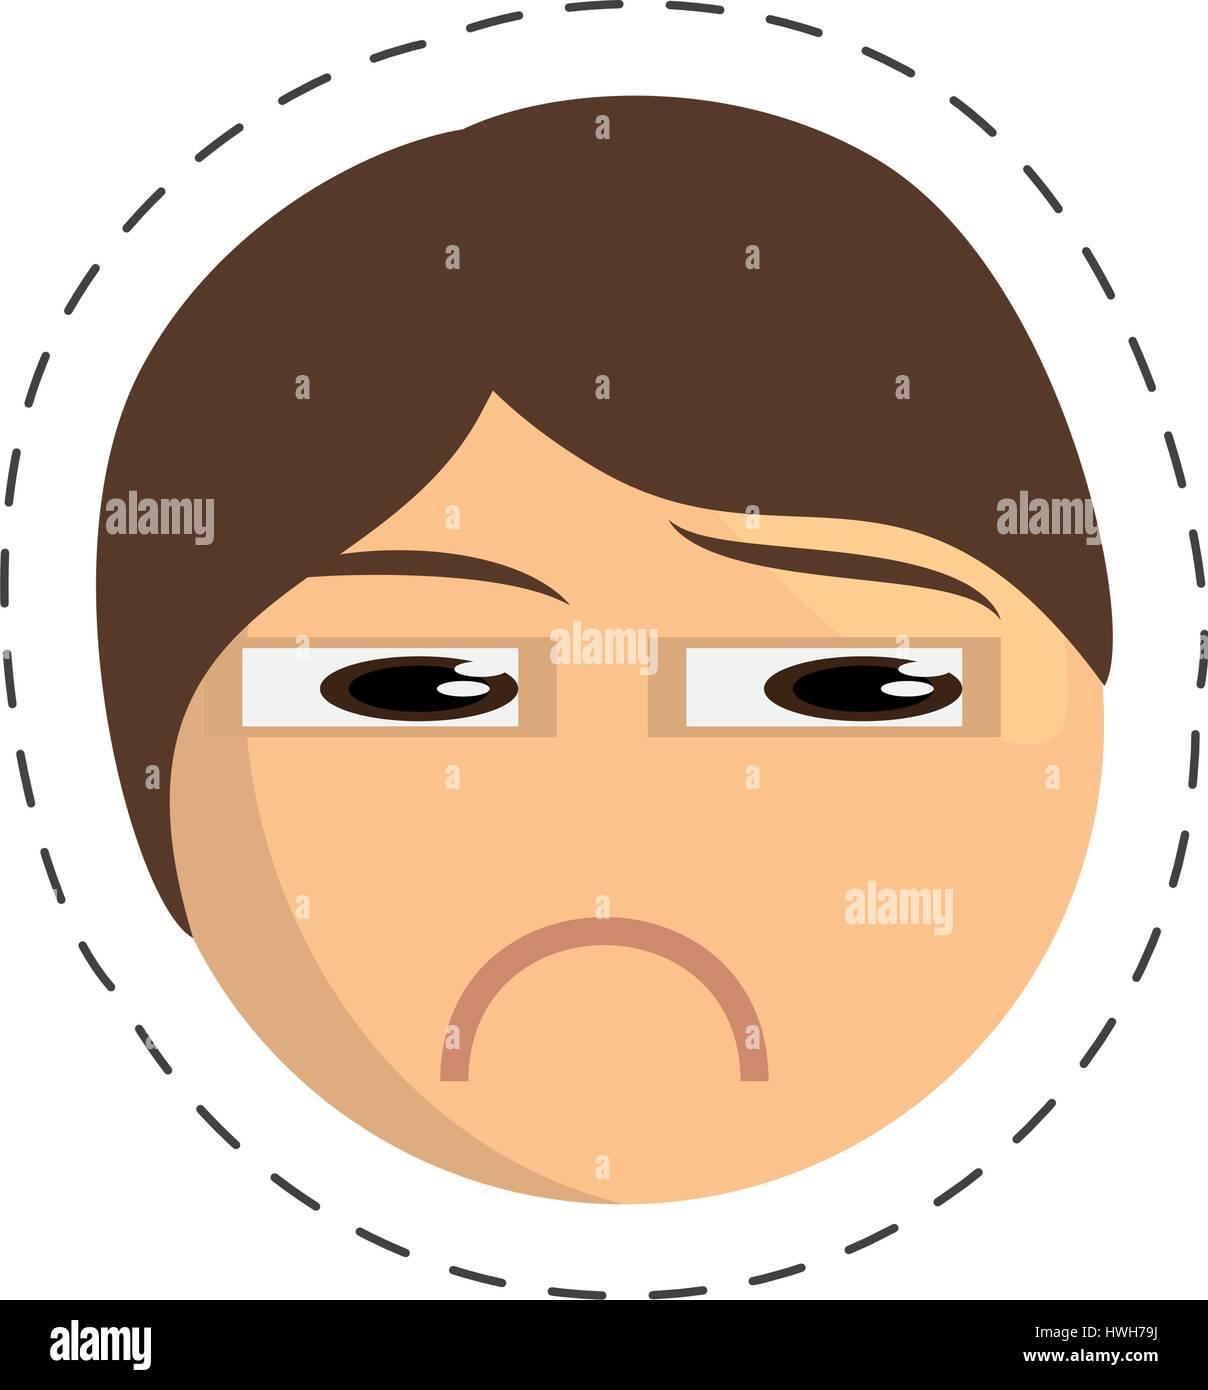 emoticon sad comic image - Stock Image